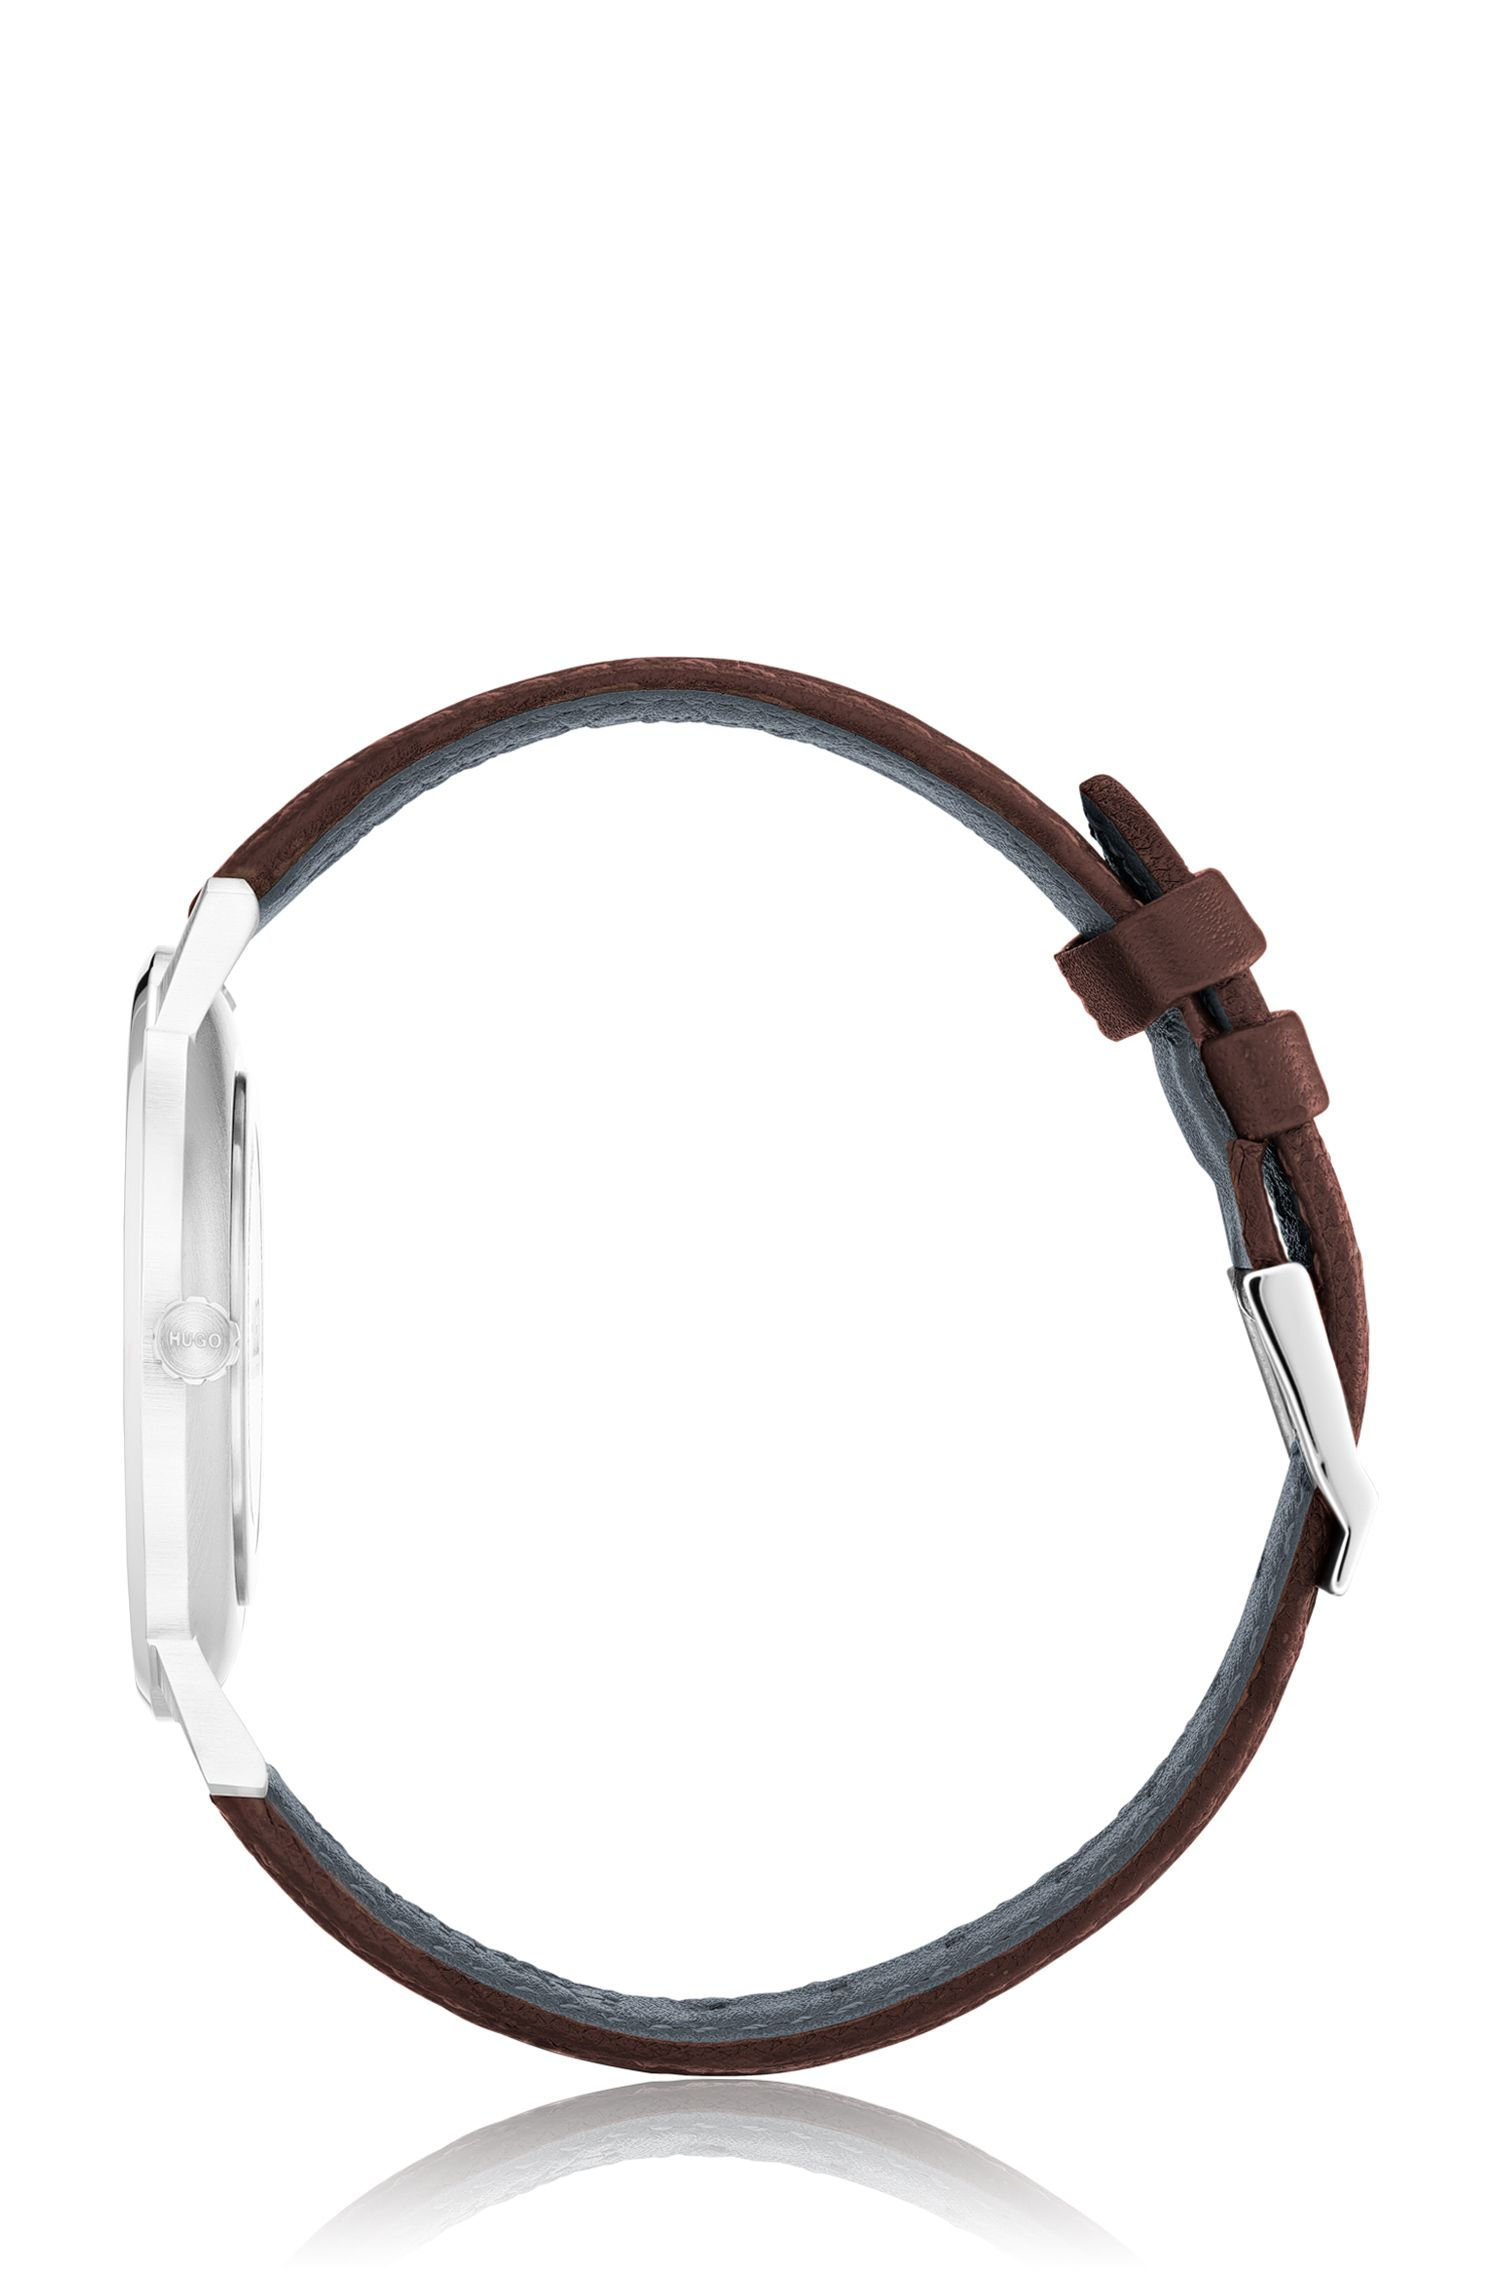 Unisex-Uhr aus Edelstahl mit braunem Lederarmband, Braun